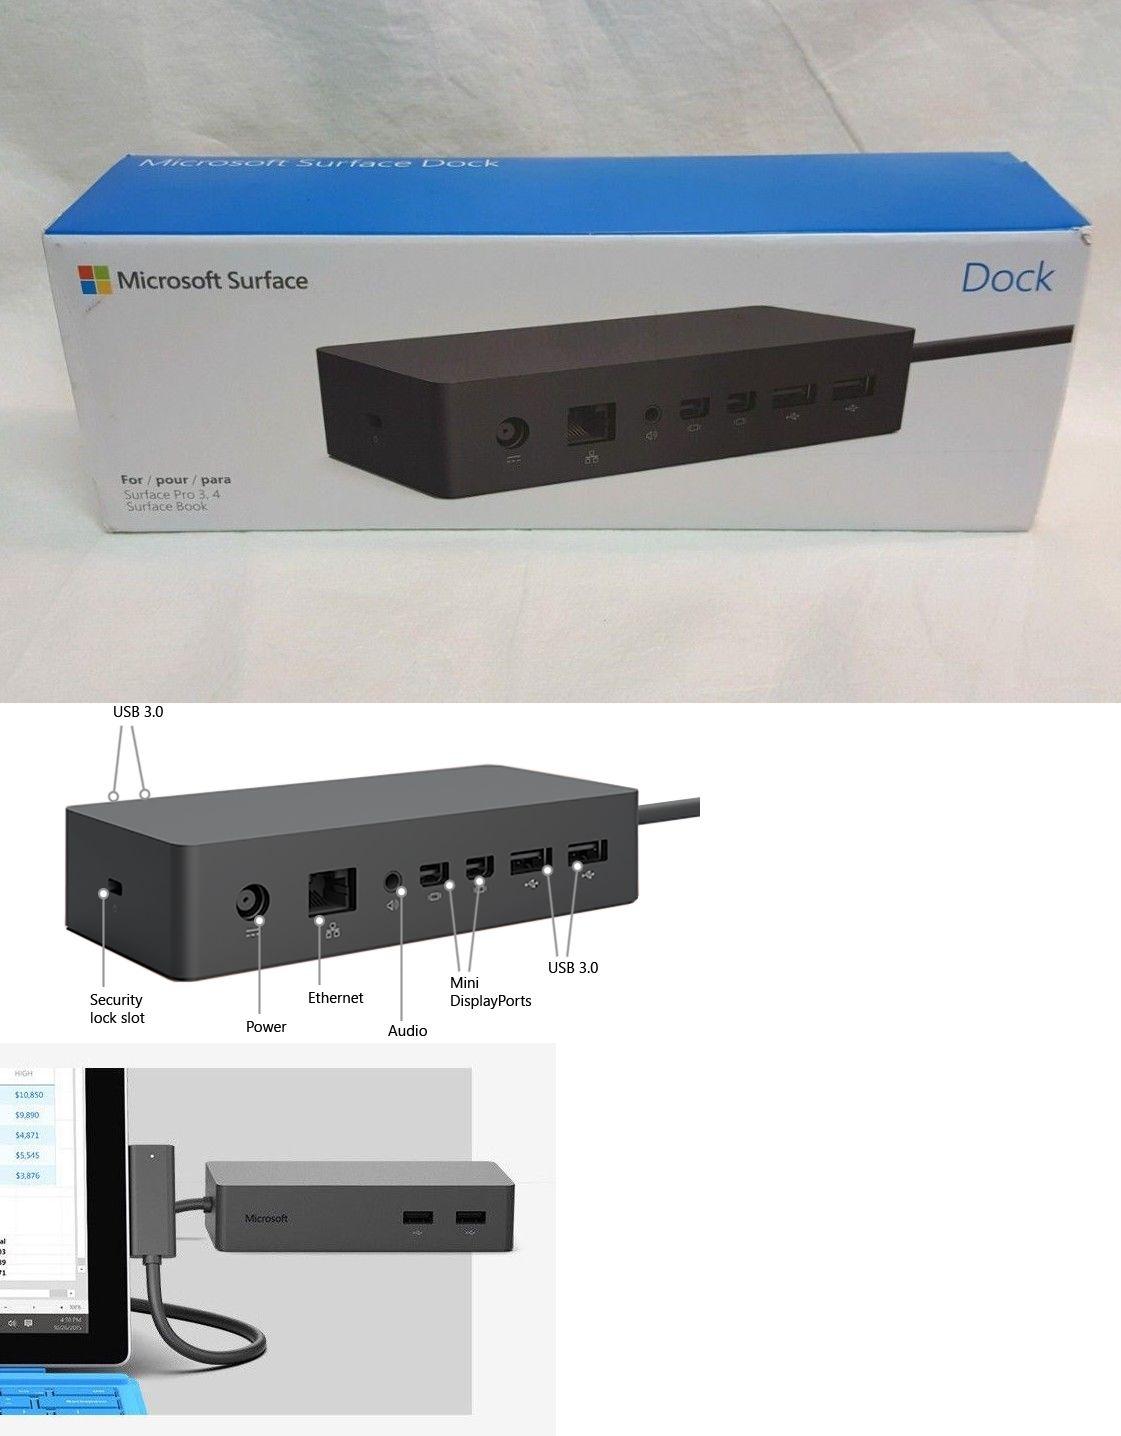 Microsoft Surface Dock For Pro X 7 6 5 4 Book Docking Station Display Ports Microsoft Surface Docking Station Microsoft